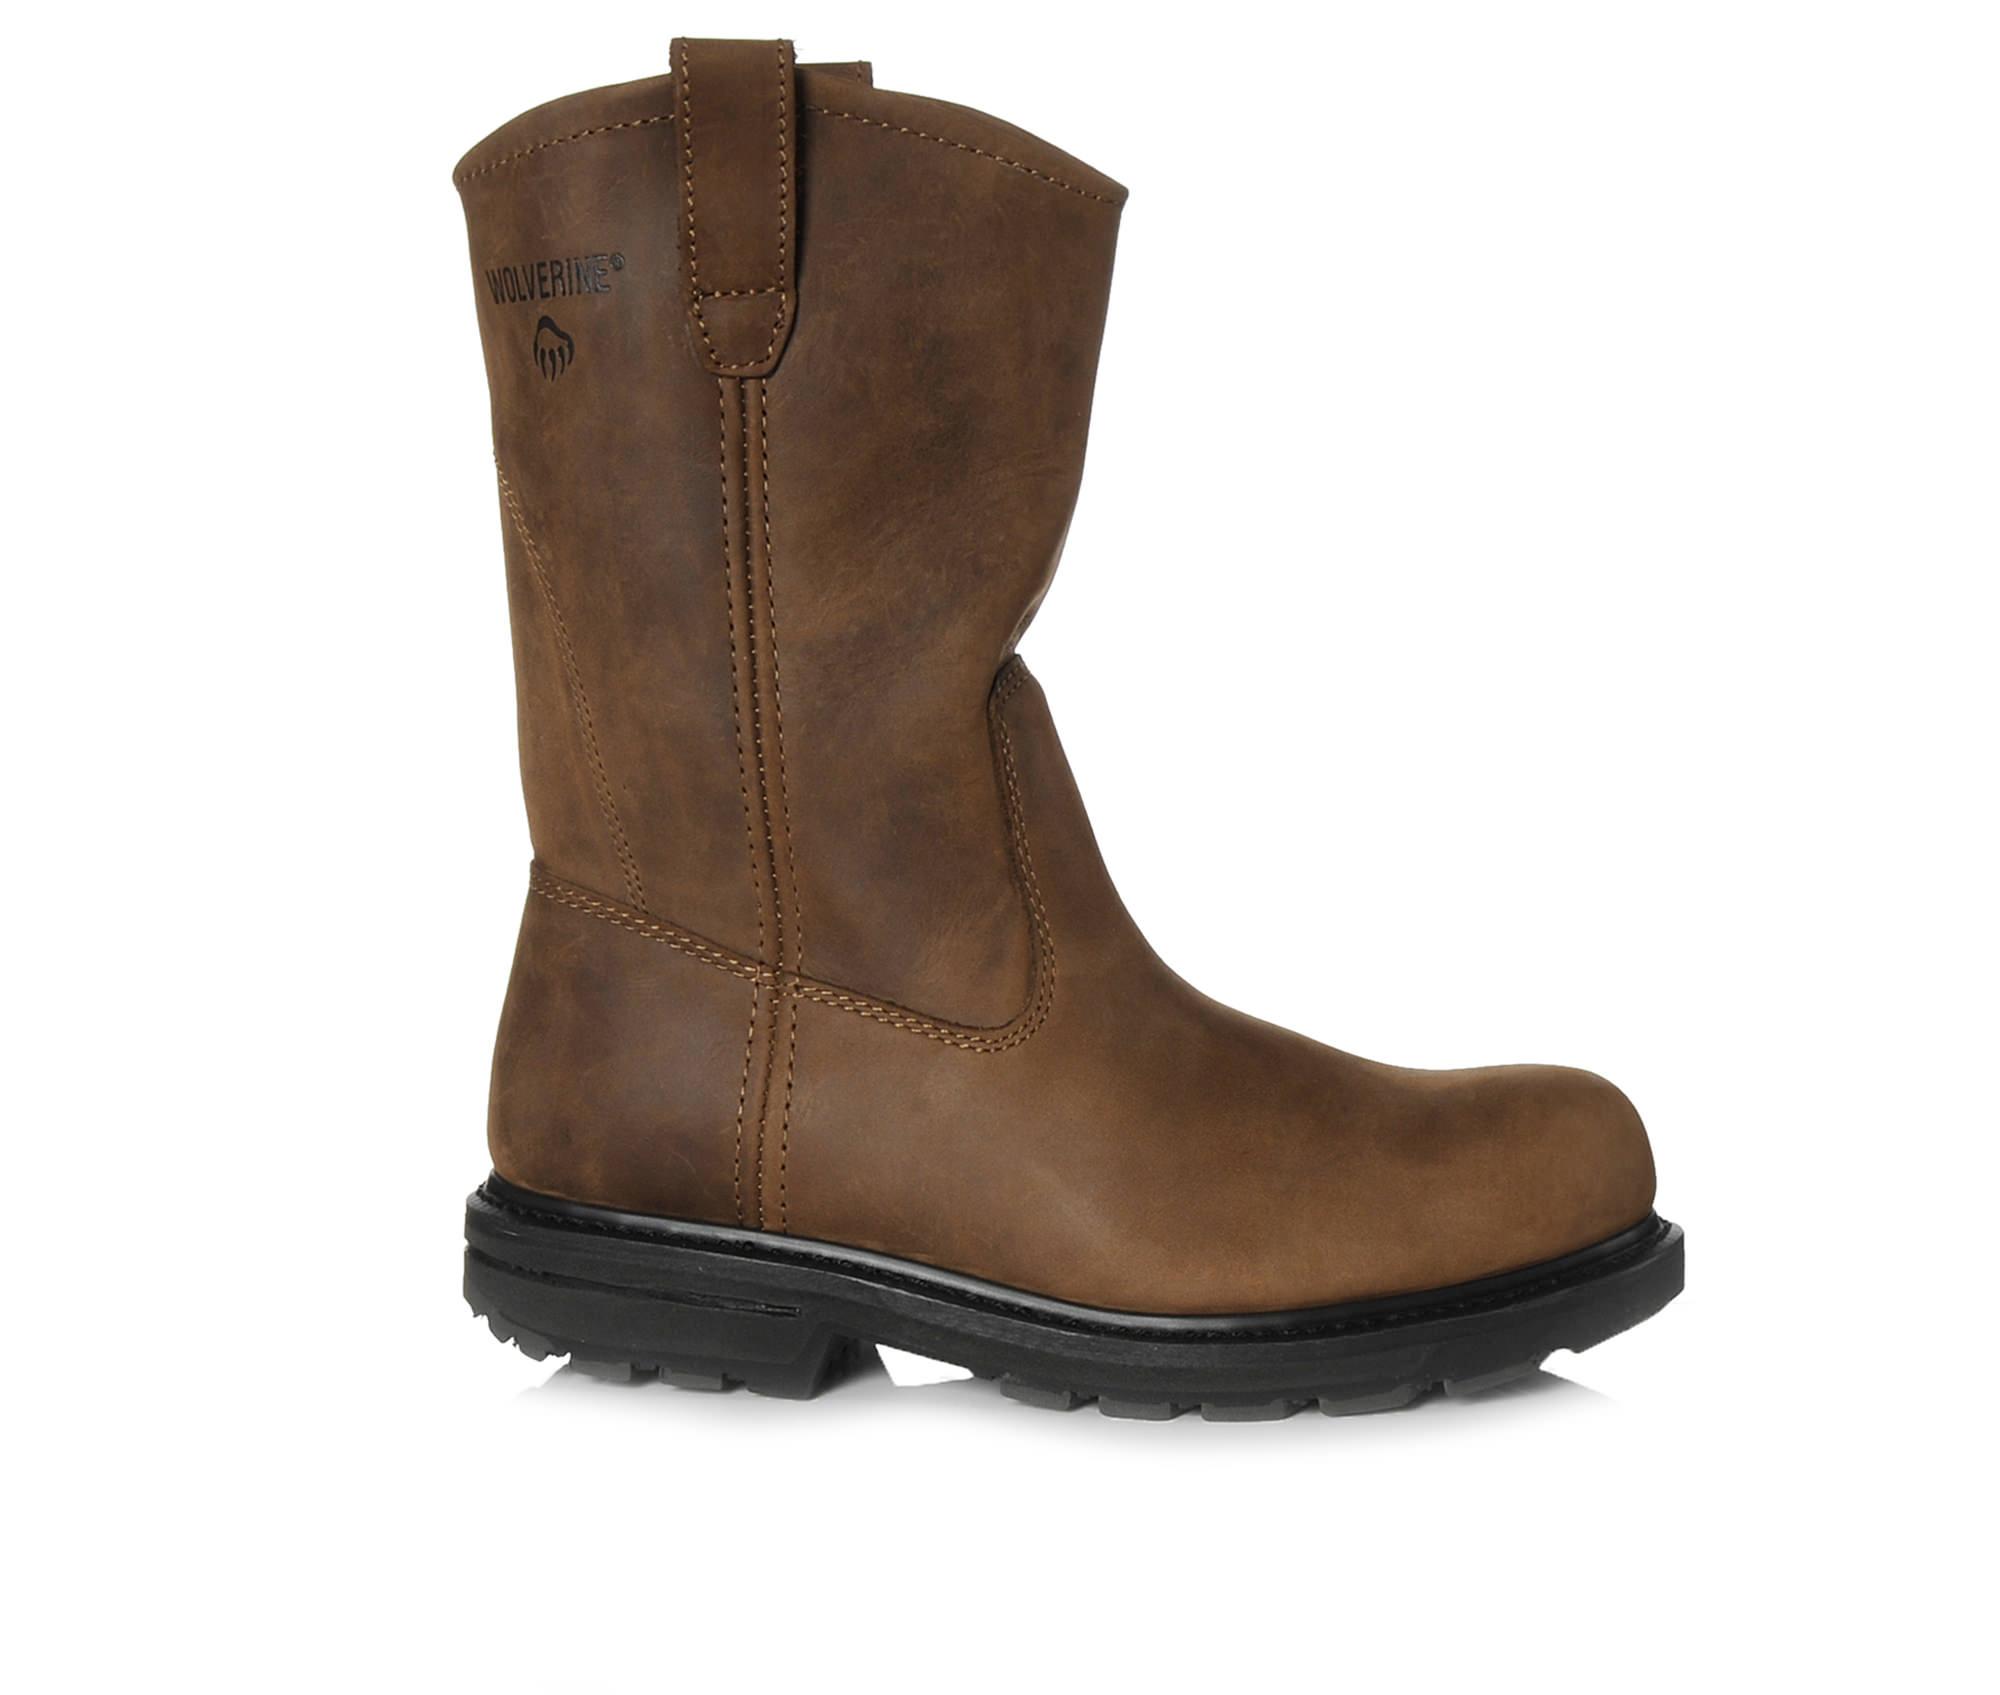 wolverine boots uk sale